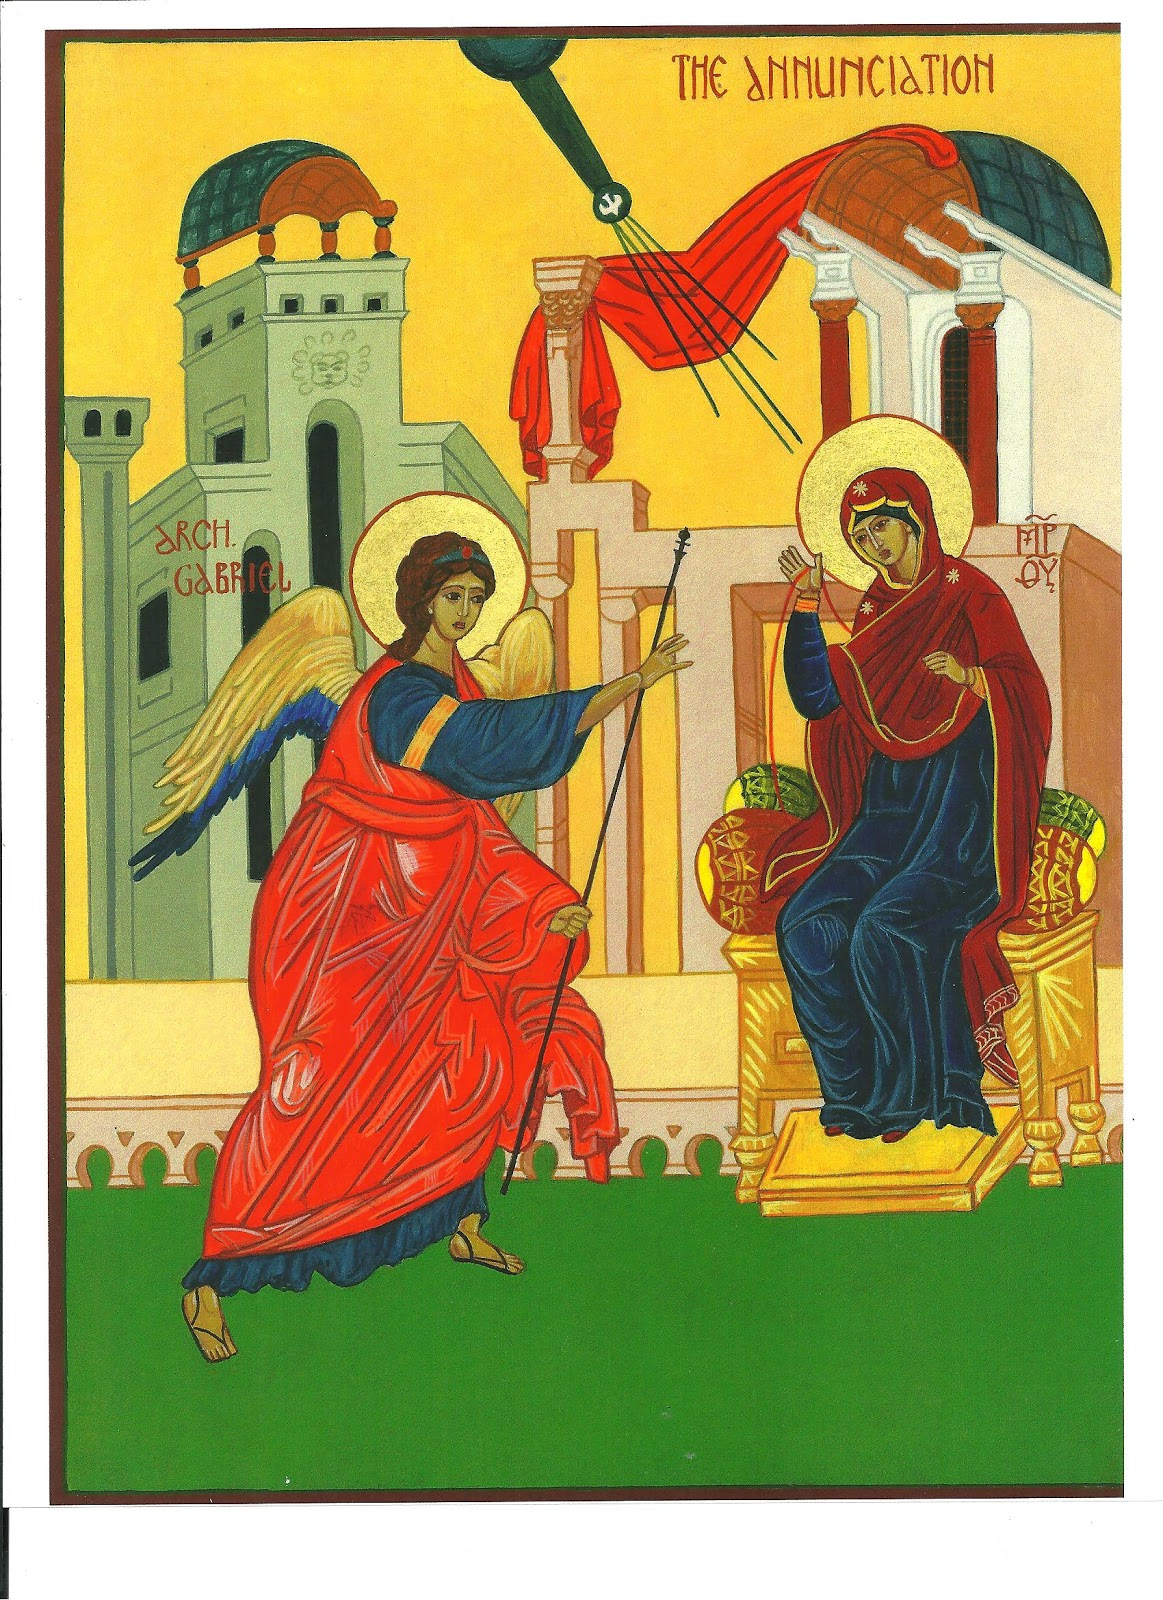 Polycarps dating of jesus birth march 21